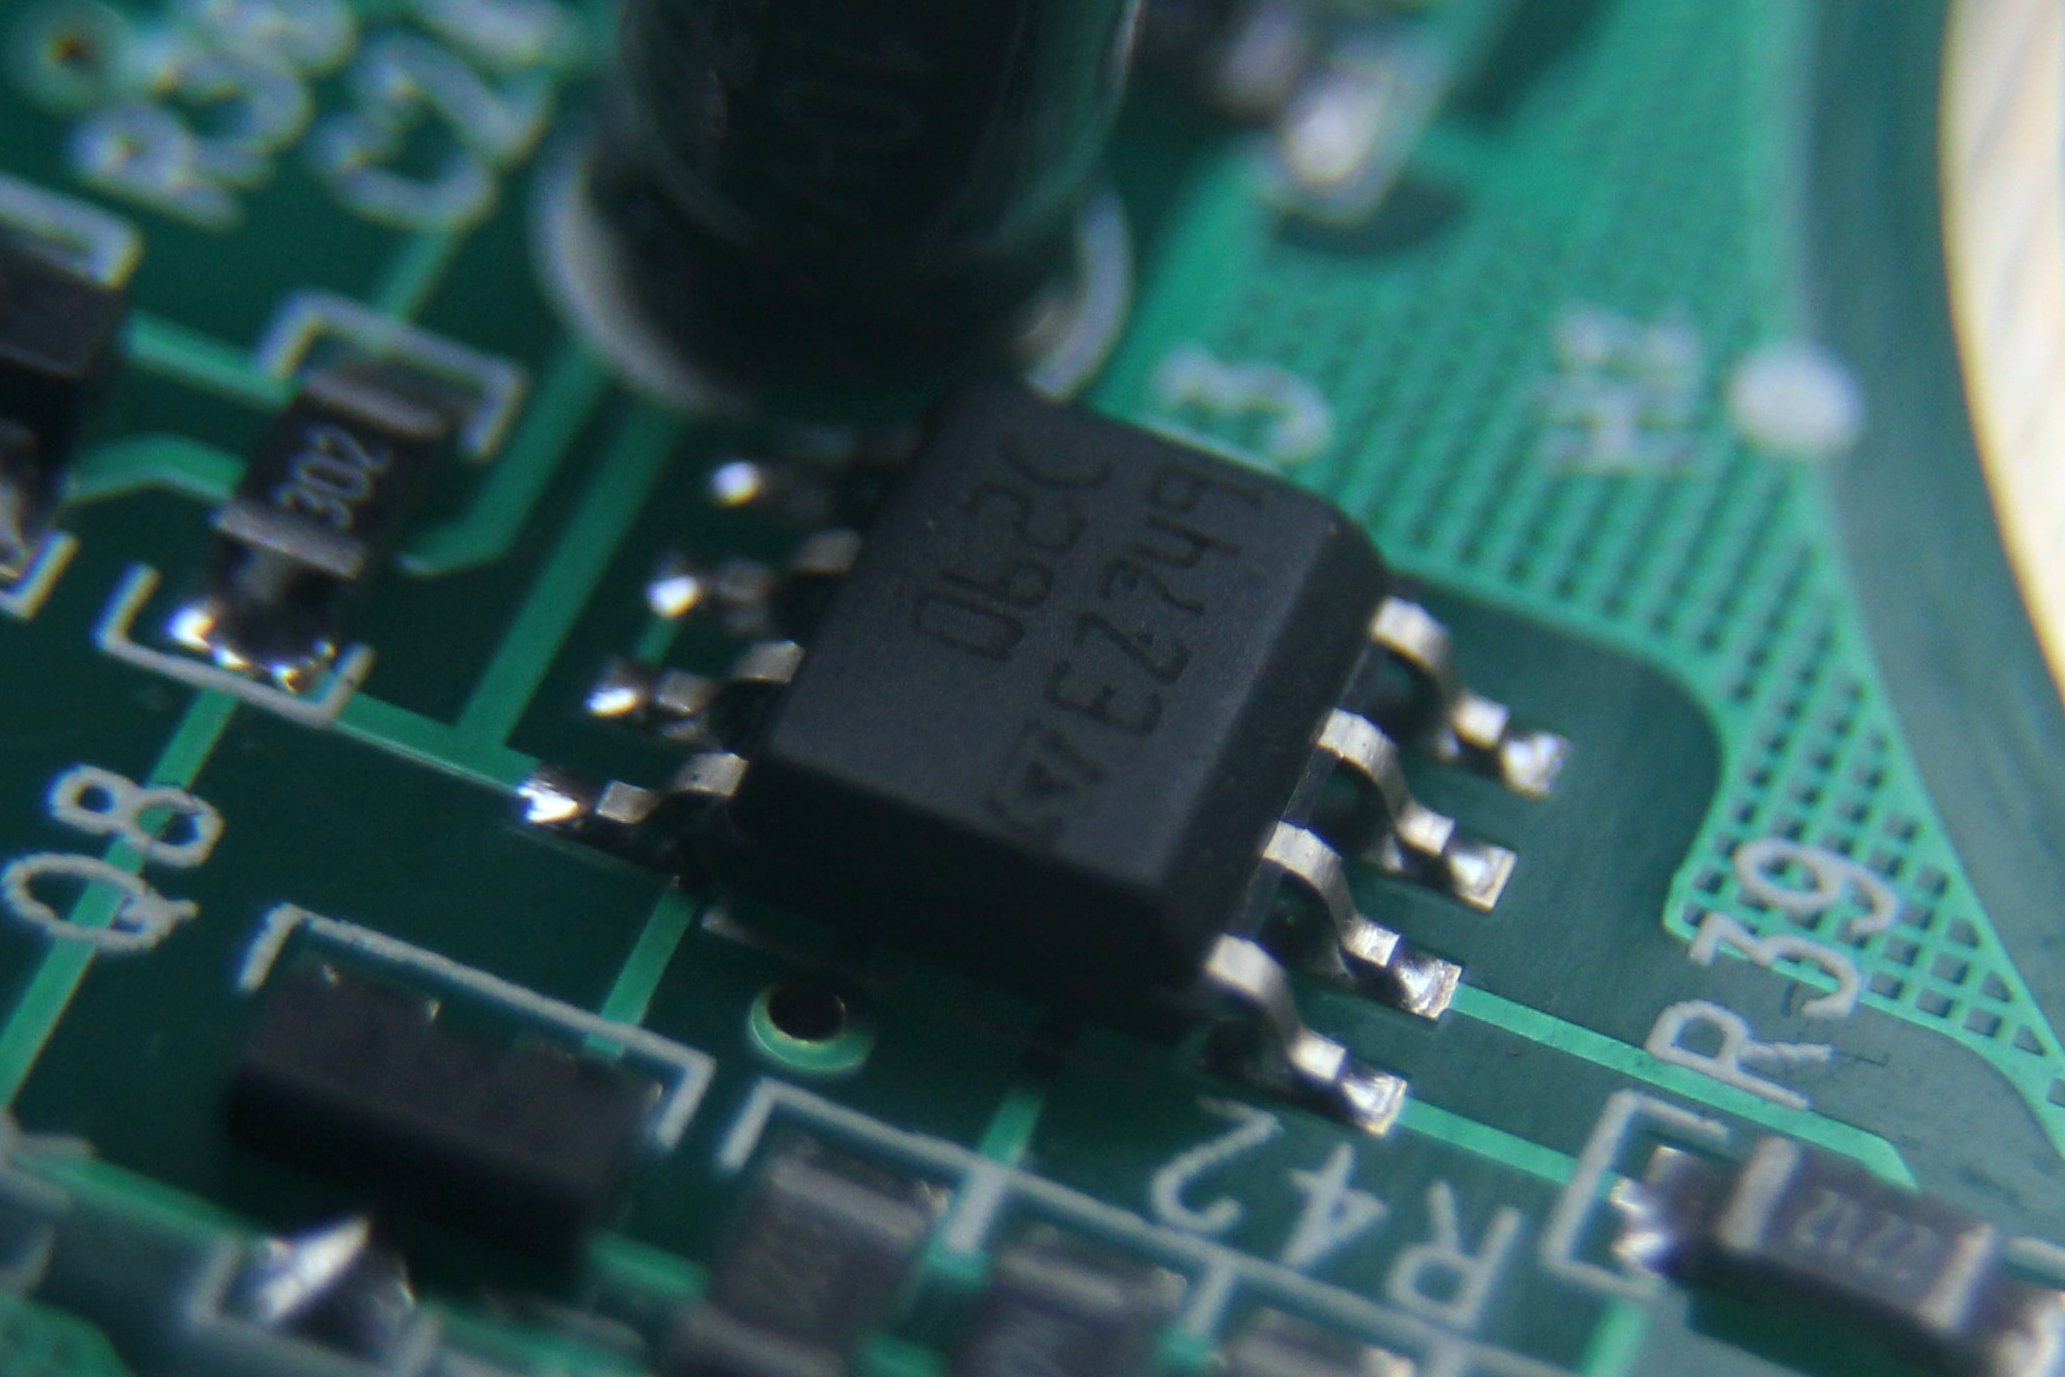 U3: 062C / EZ749, vermutlich Low-power JFET dual operational amplifiers